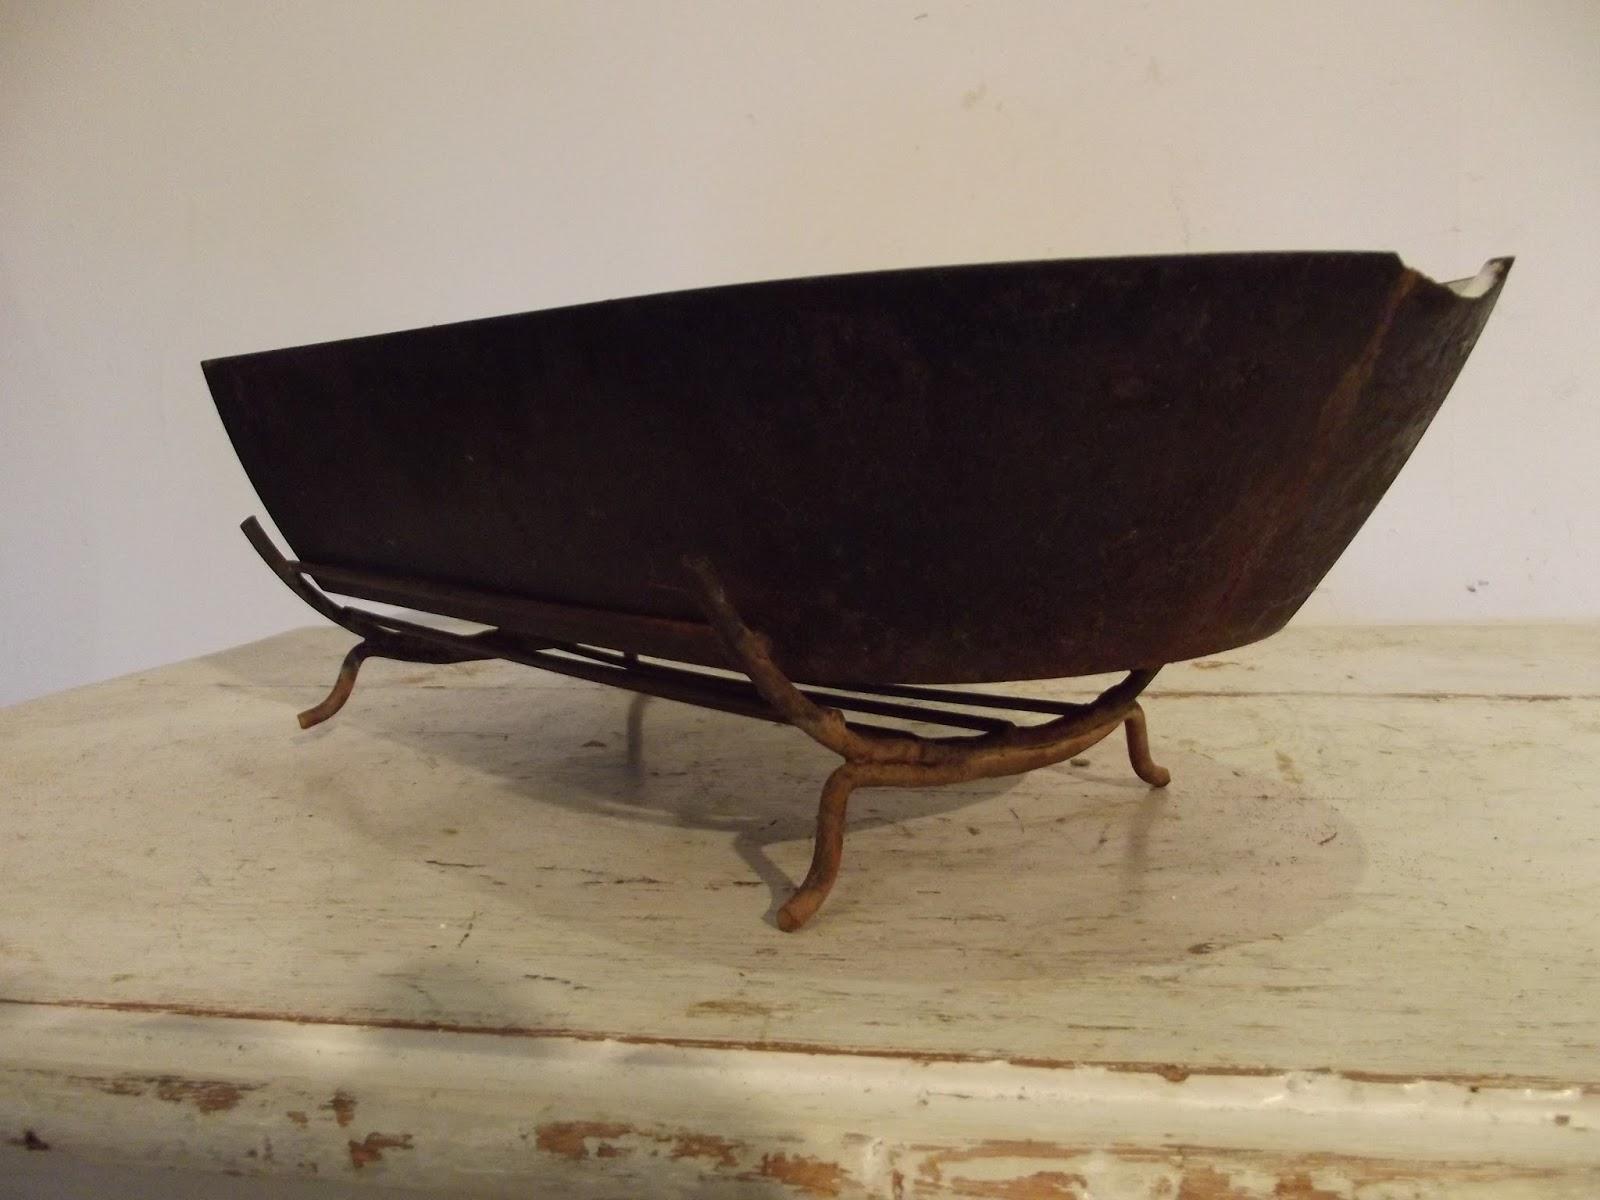 l che frite plat a jus en fonte pour tourne broche de chemin e estampill couron ebay. Black Bedroom Furniture Sets. Home Design Ideas